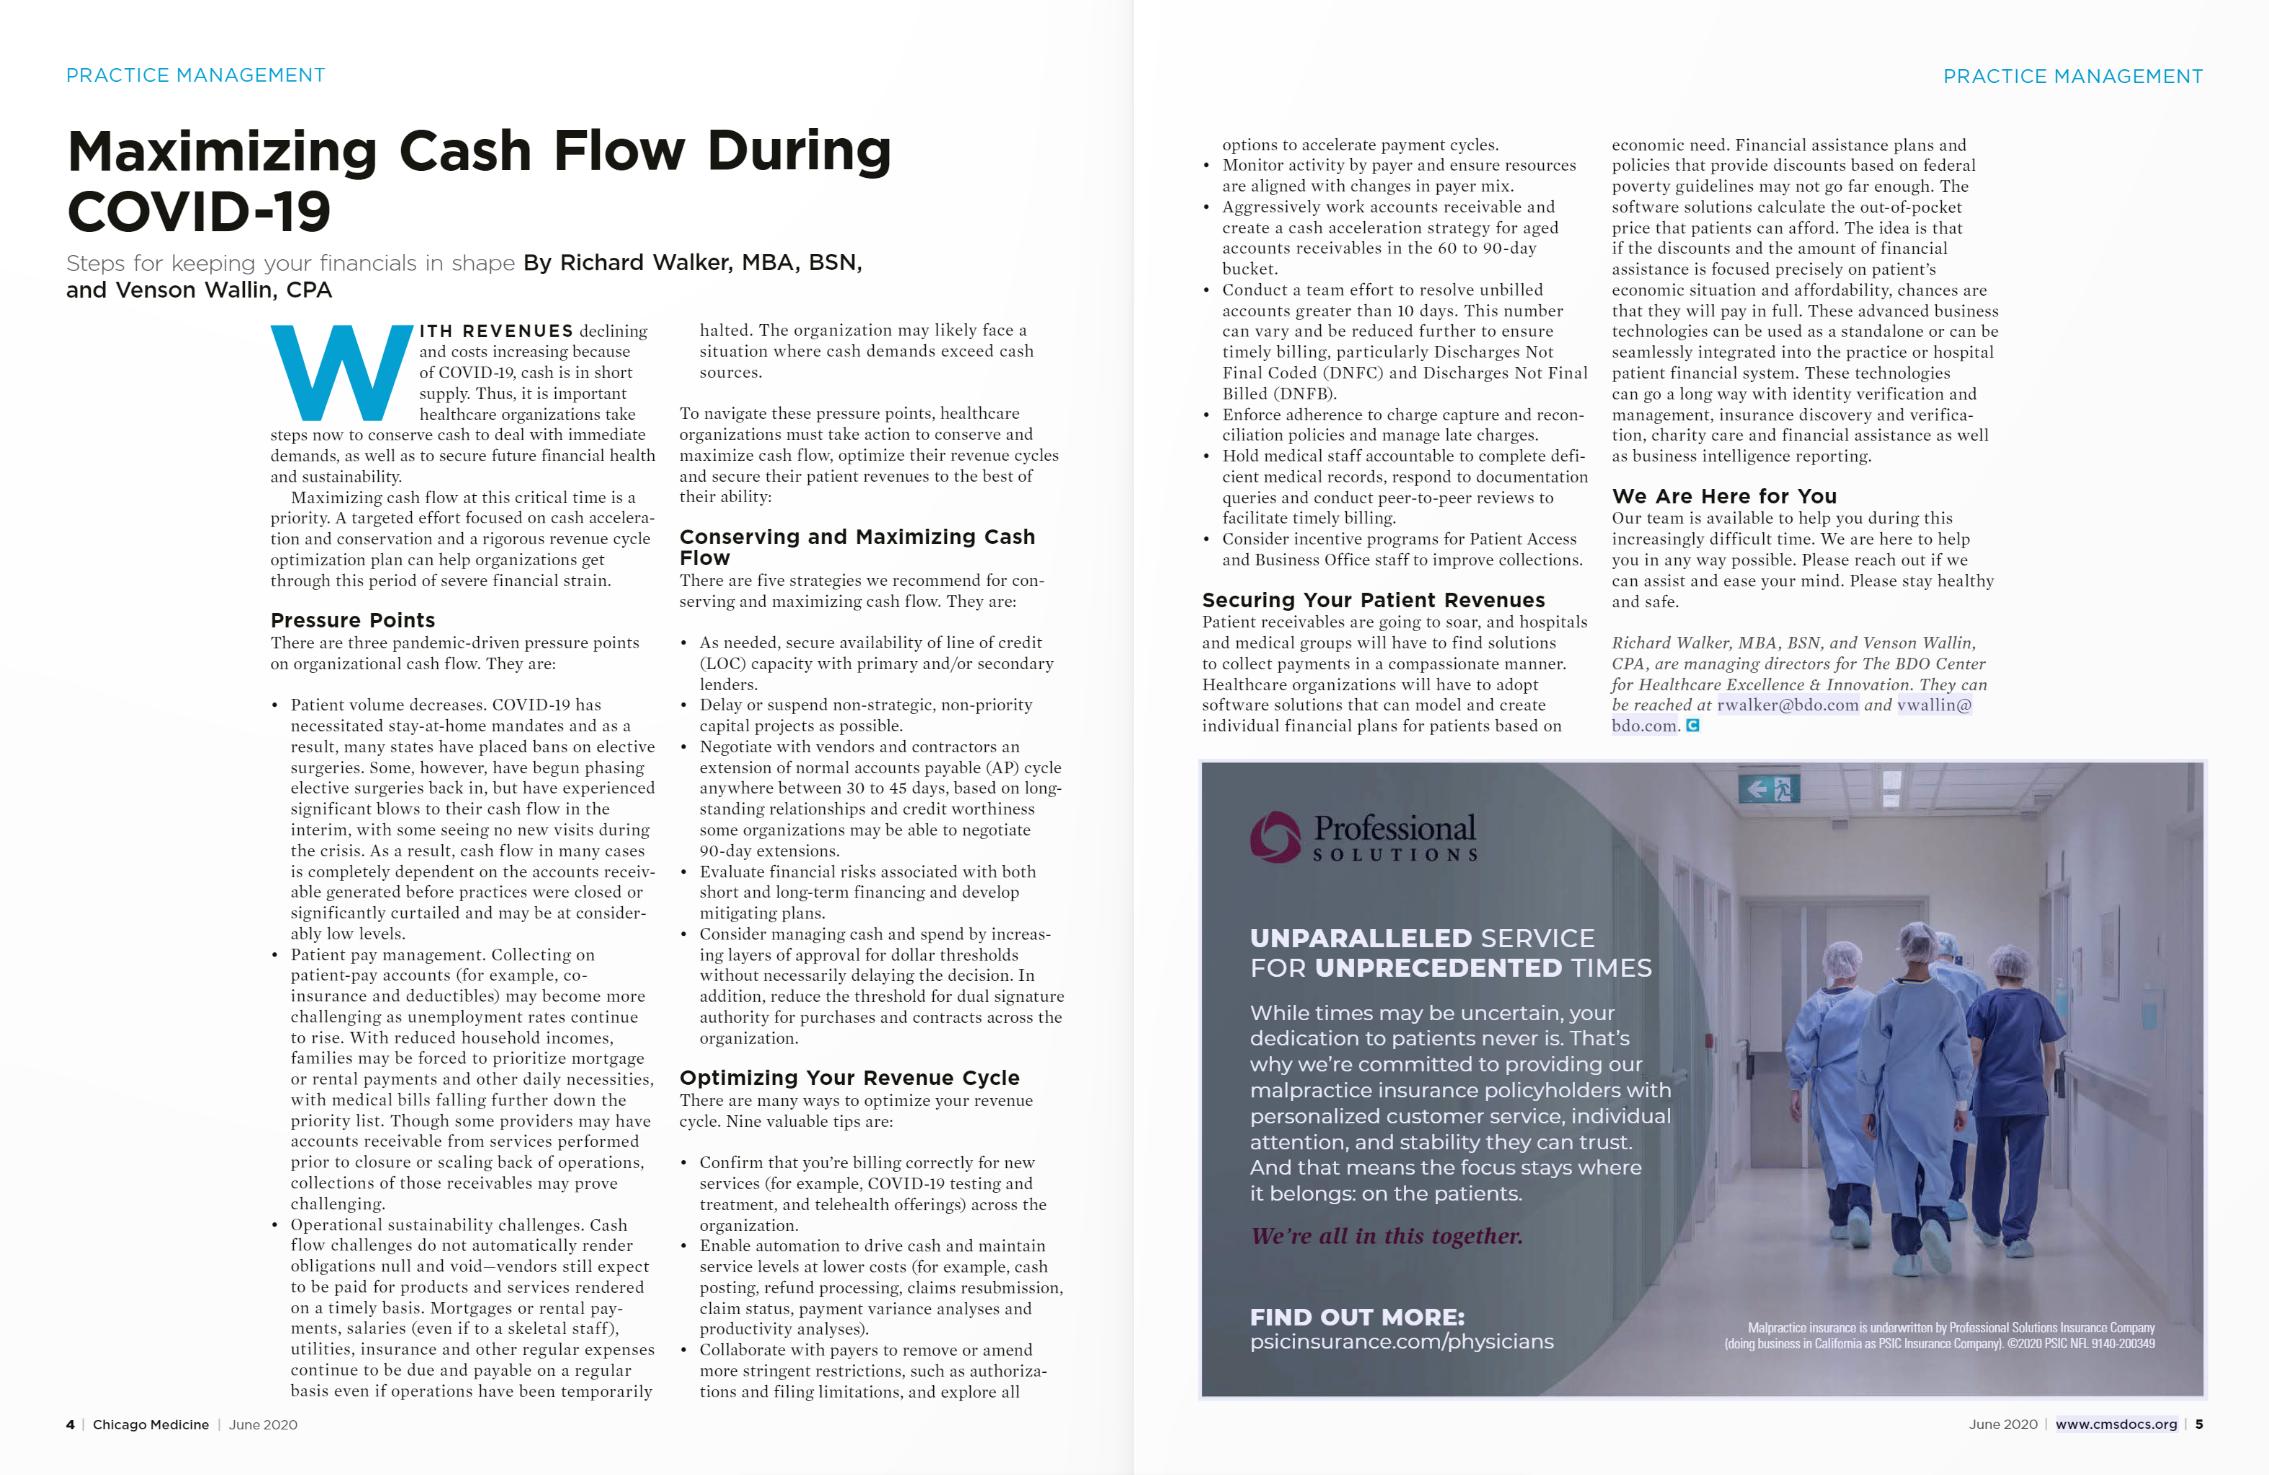 Maximizing Cash Flow During COVID-19